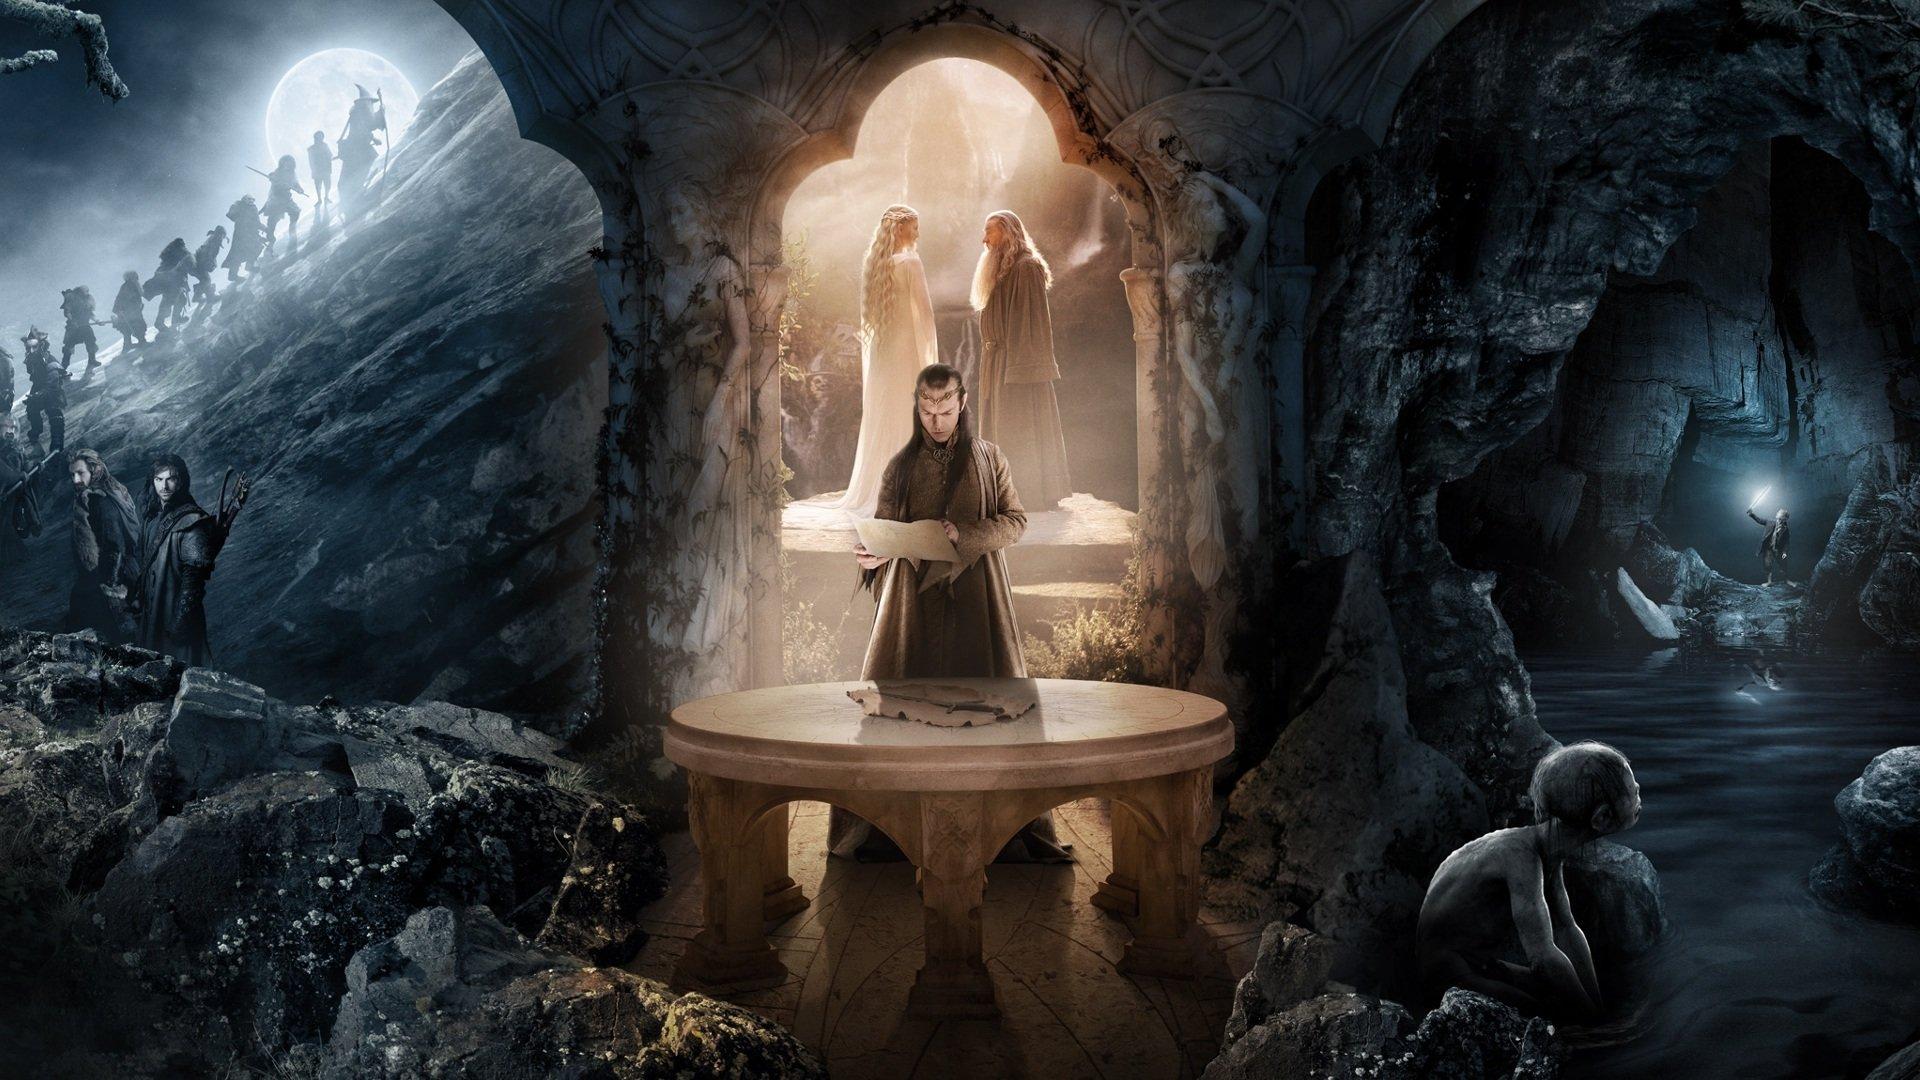 the hobbit wallpaper 1080p | Babangrichie org